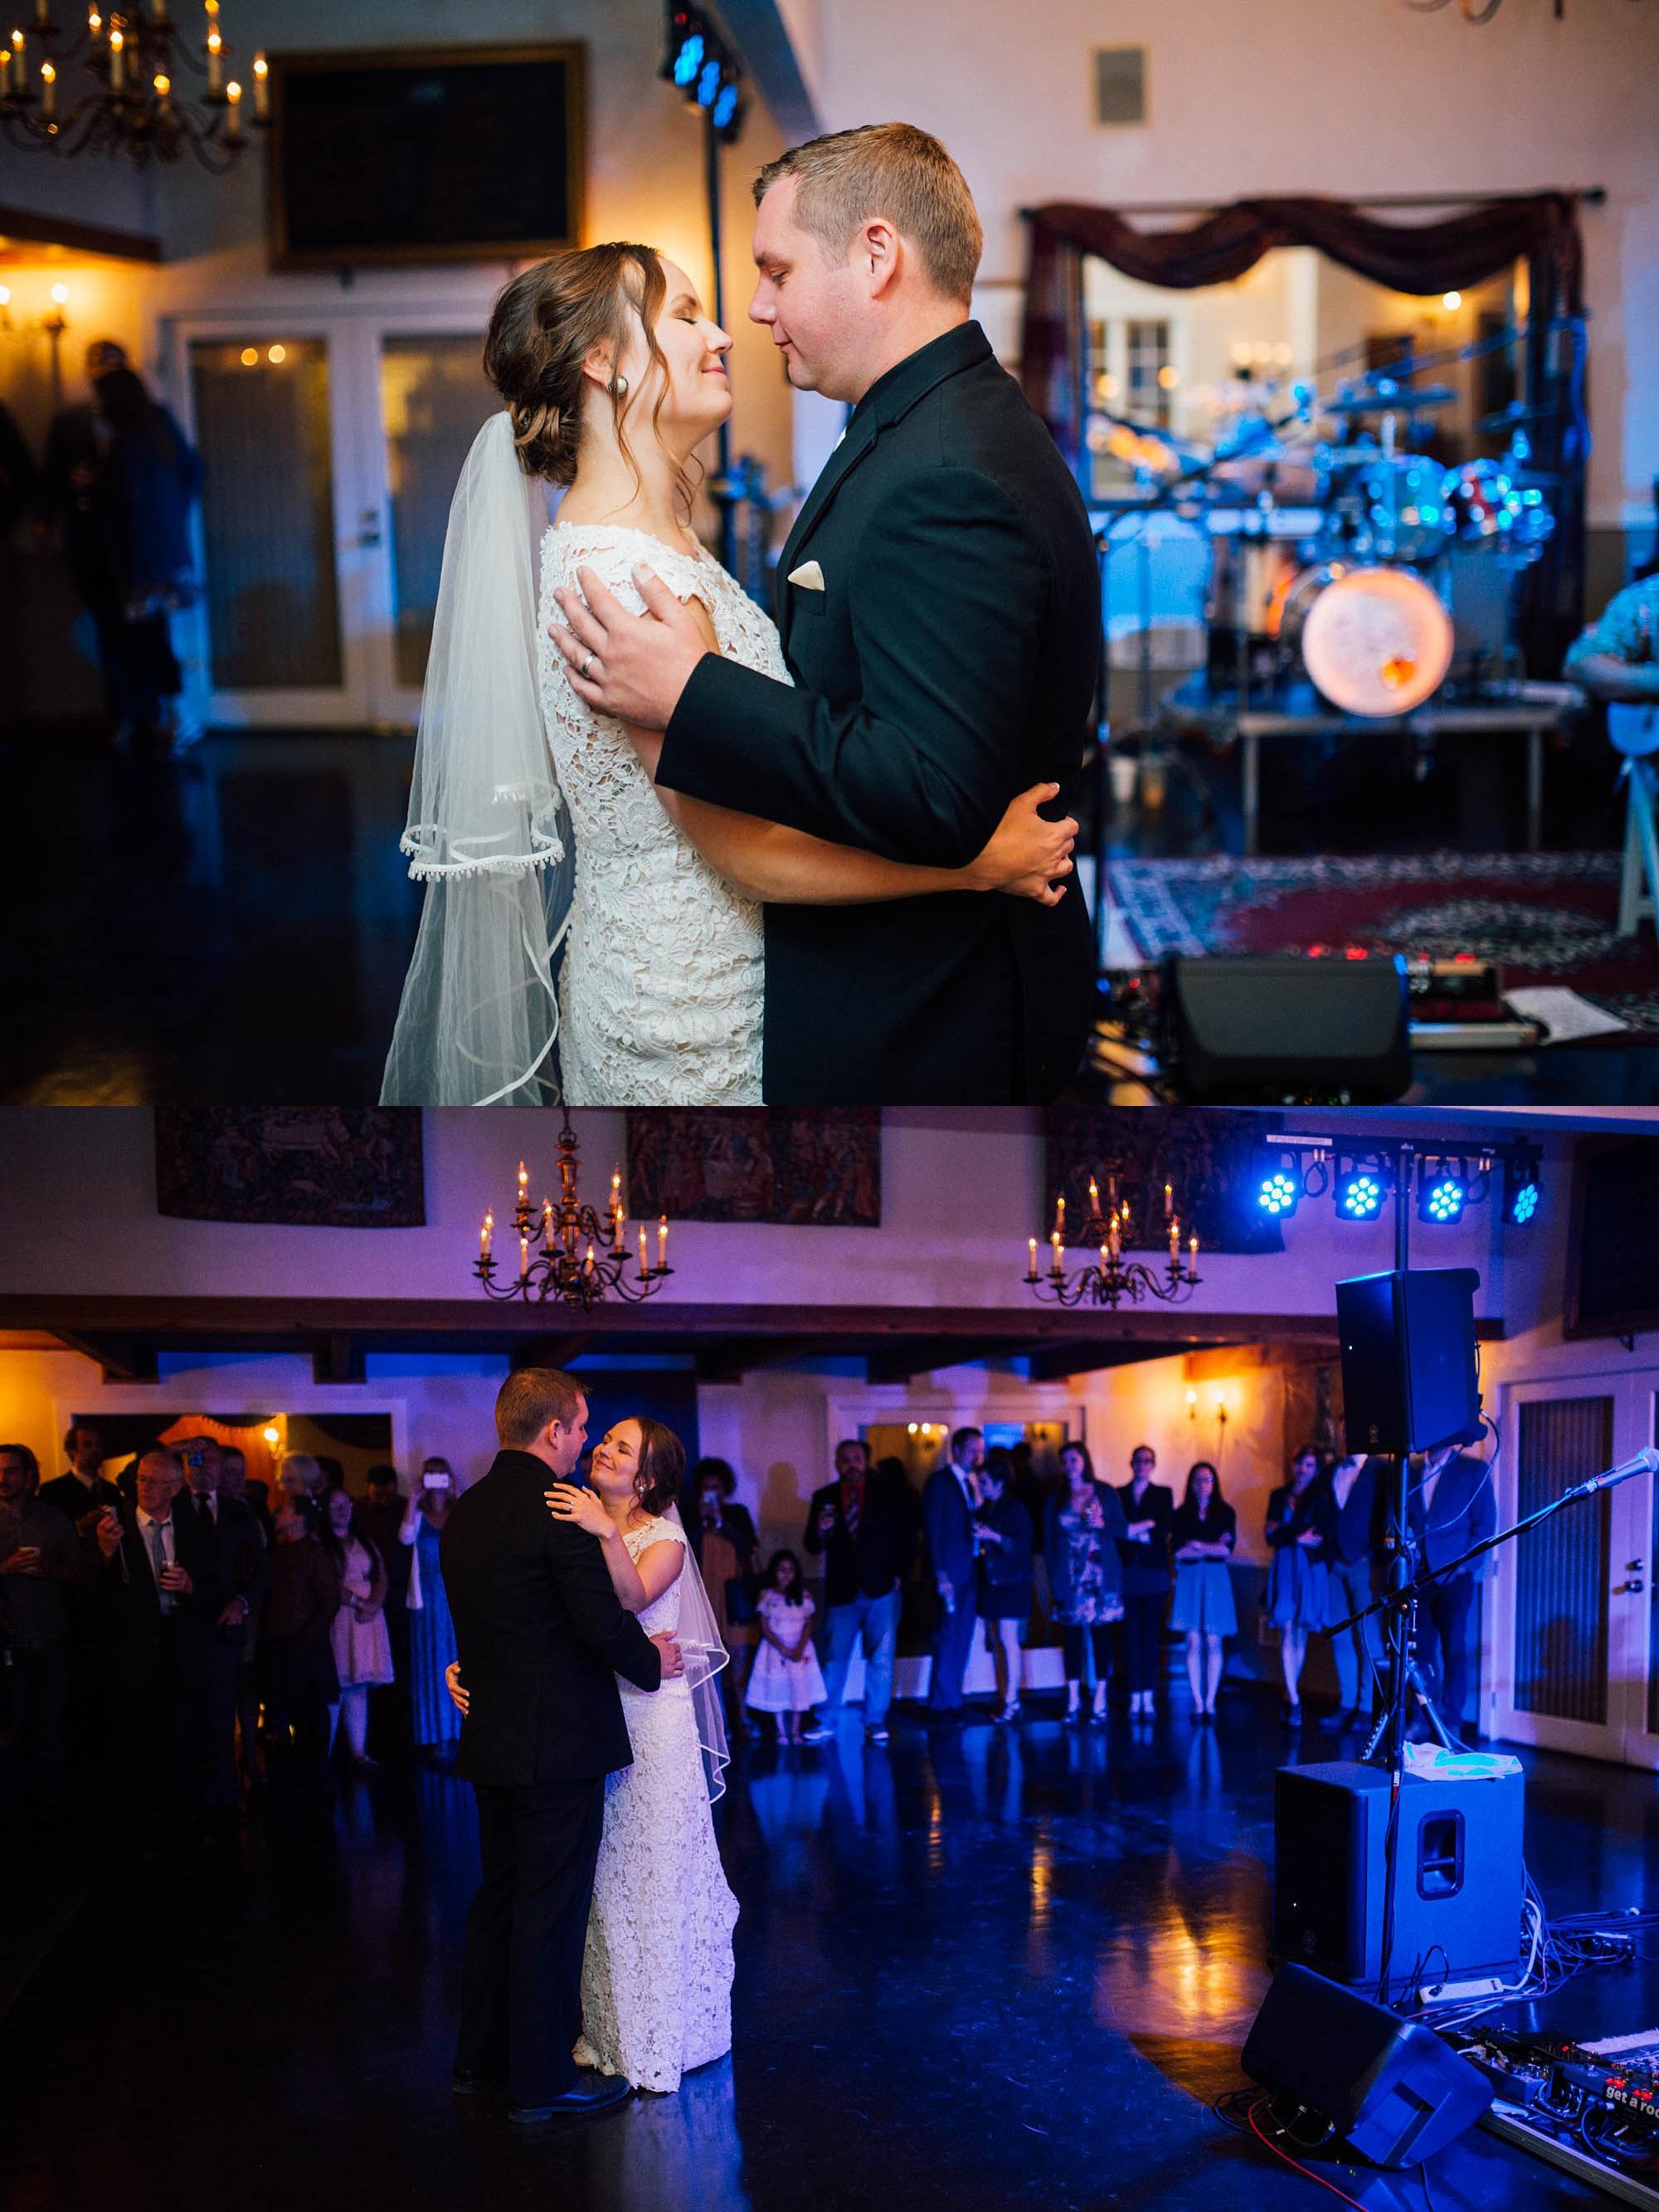 ashley_vos_seattle_ wedding_photographer_0204.jpg